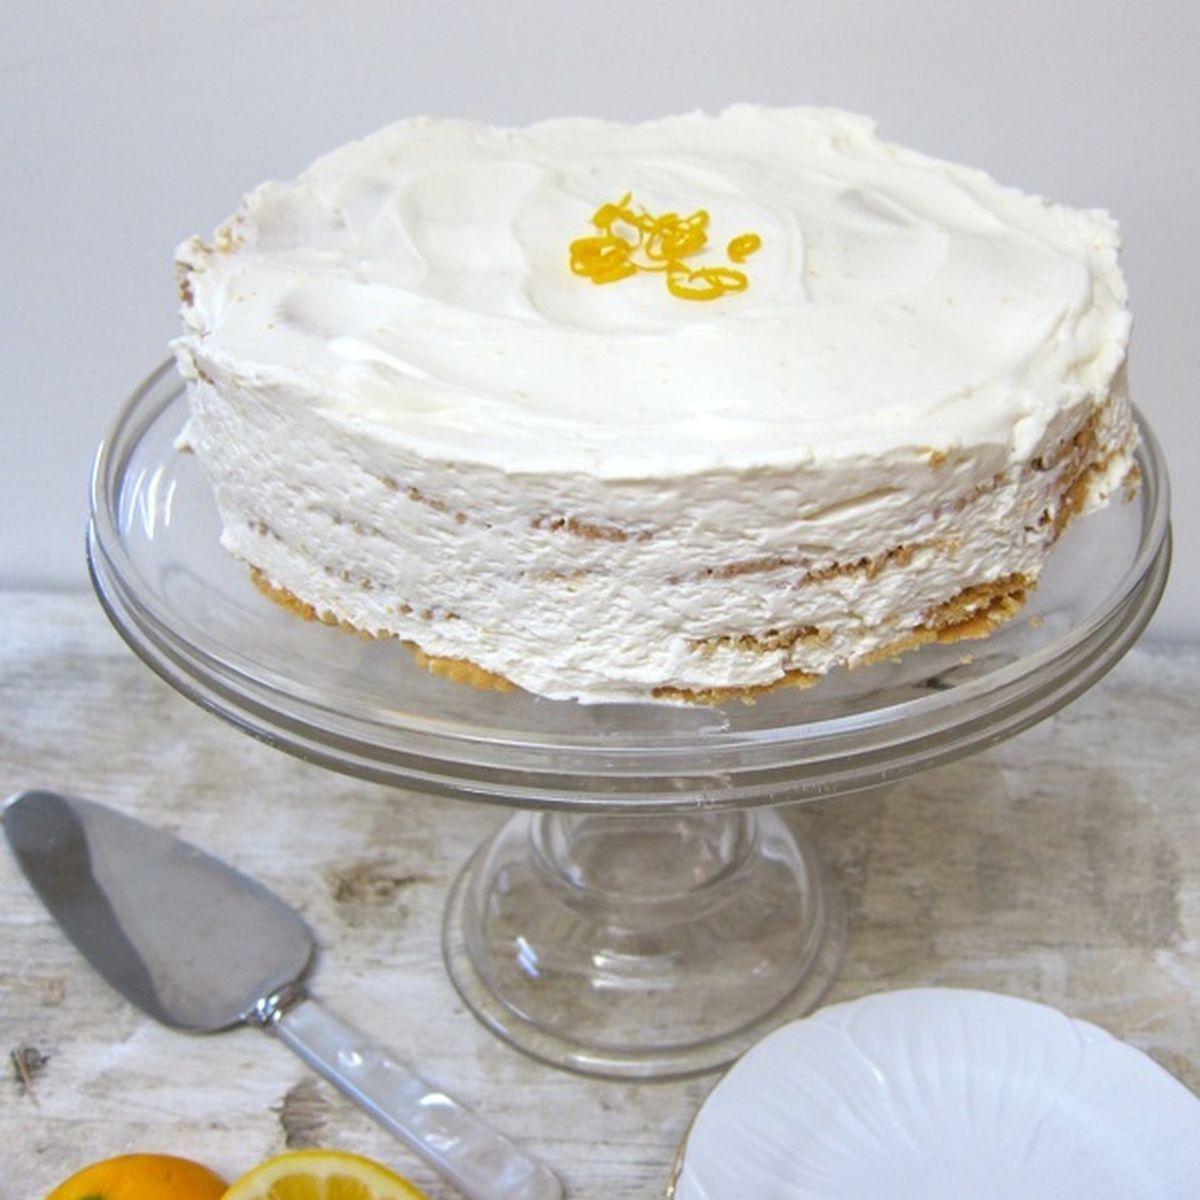 Meyer Lemon Icebox Cake Recipe on Food52